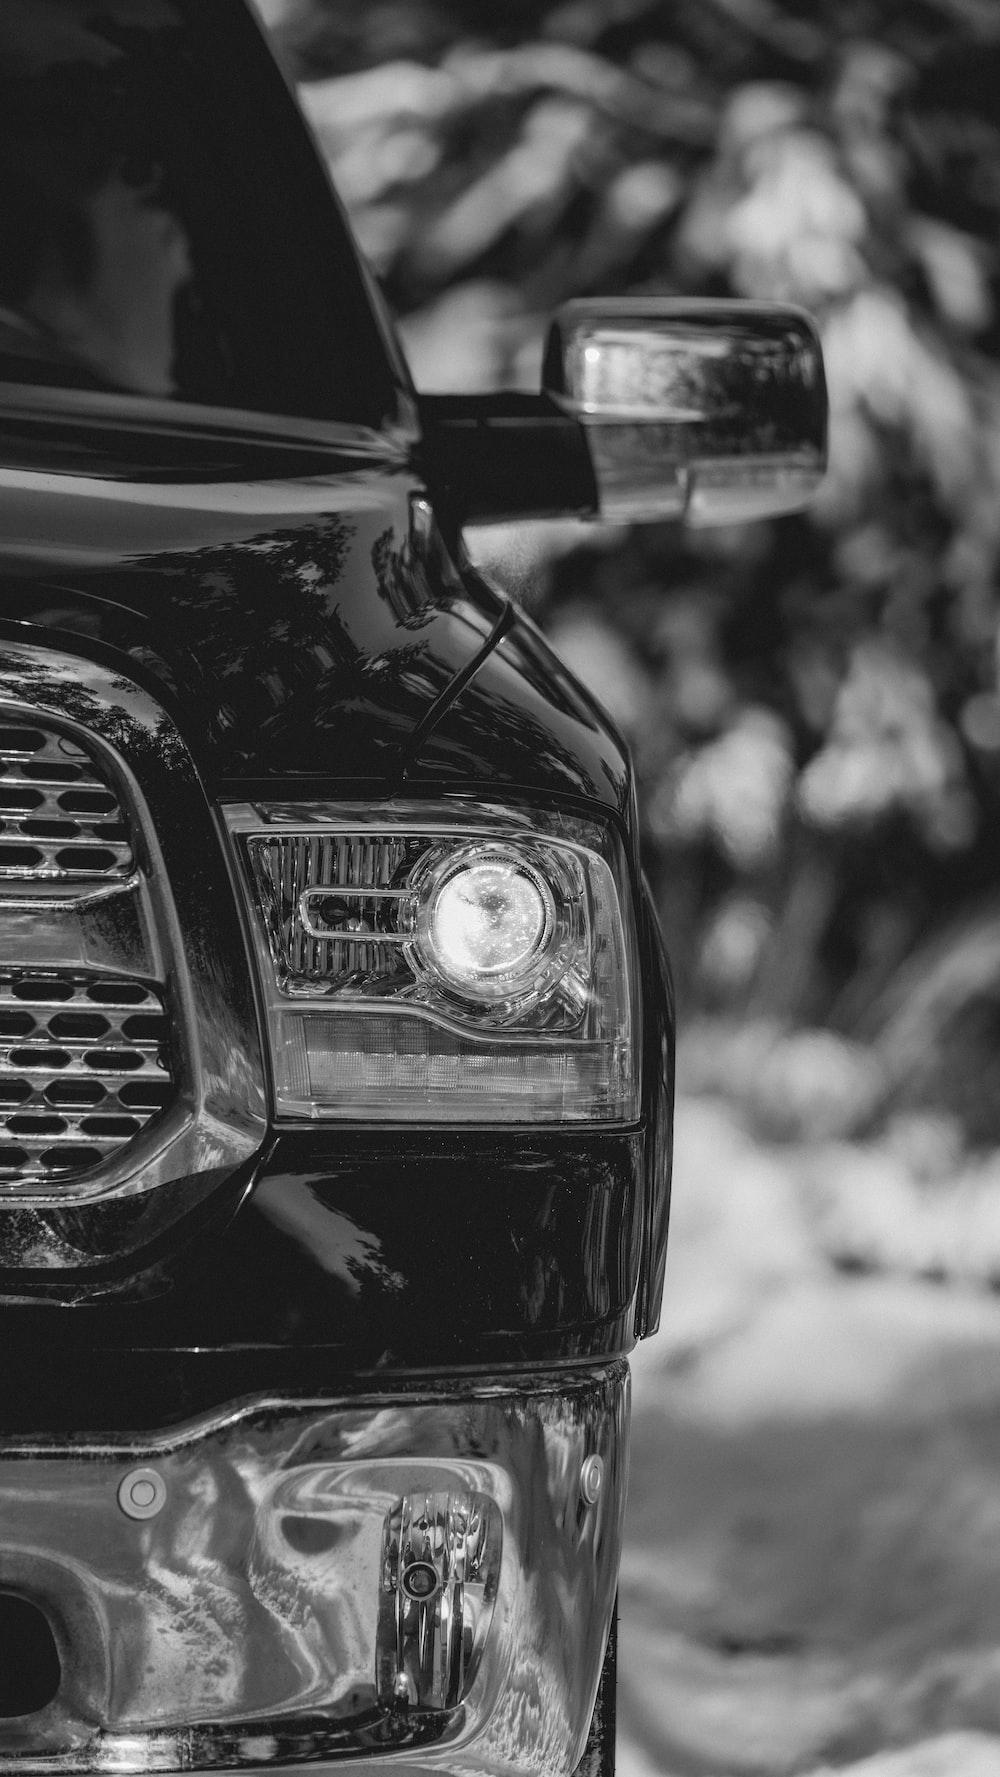 grayscale photo of cars headlight